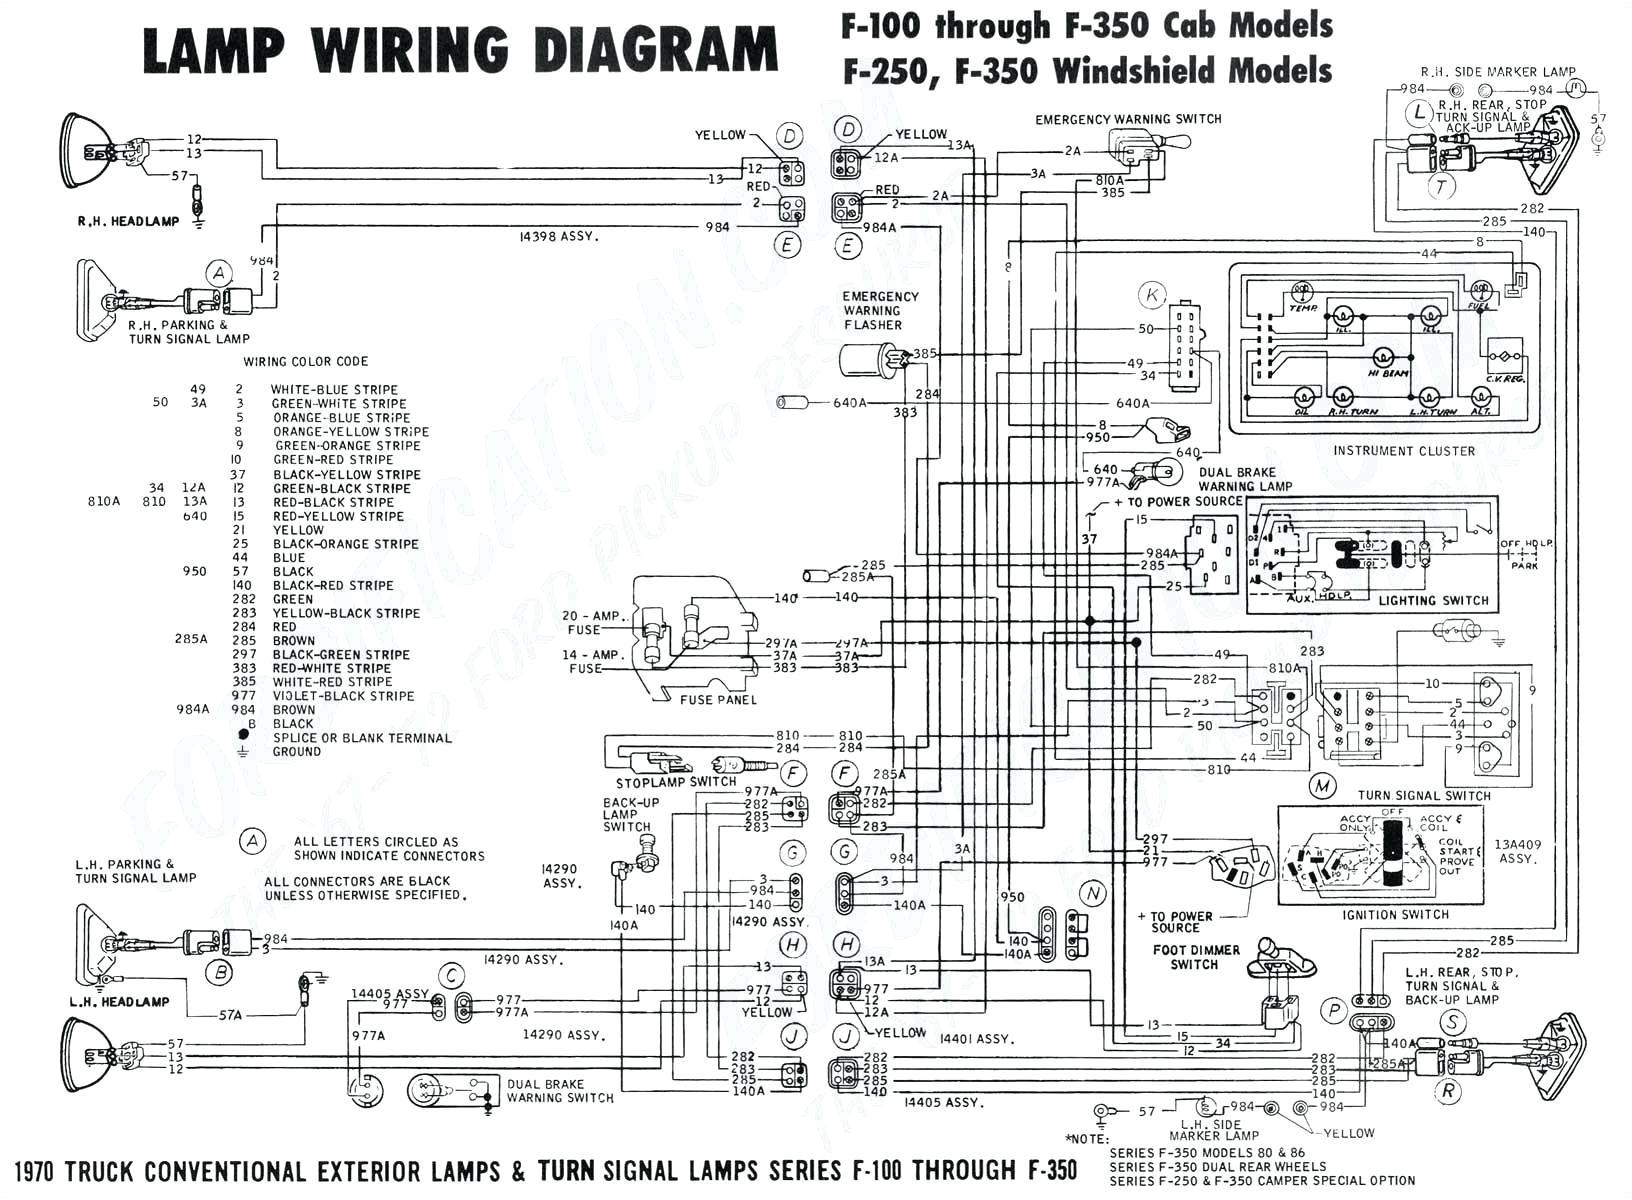 1978 ford 7000 voltage regulator diagram wiring diagram expert 1978 ford 7000 voltage regulator diagram